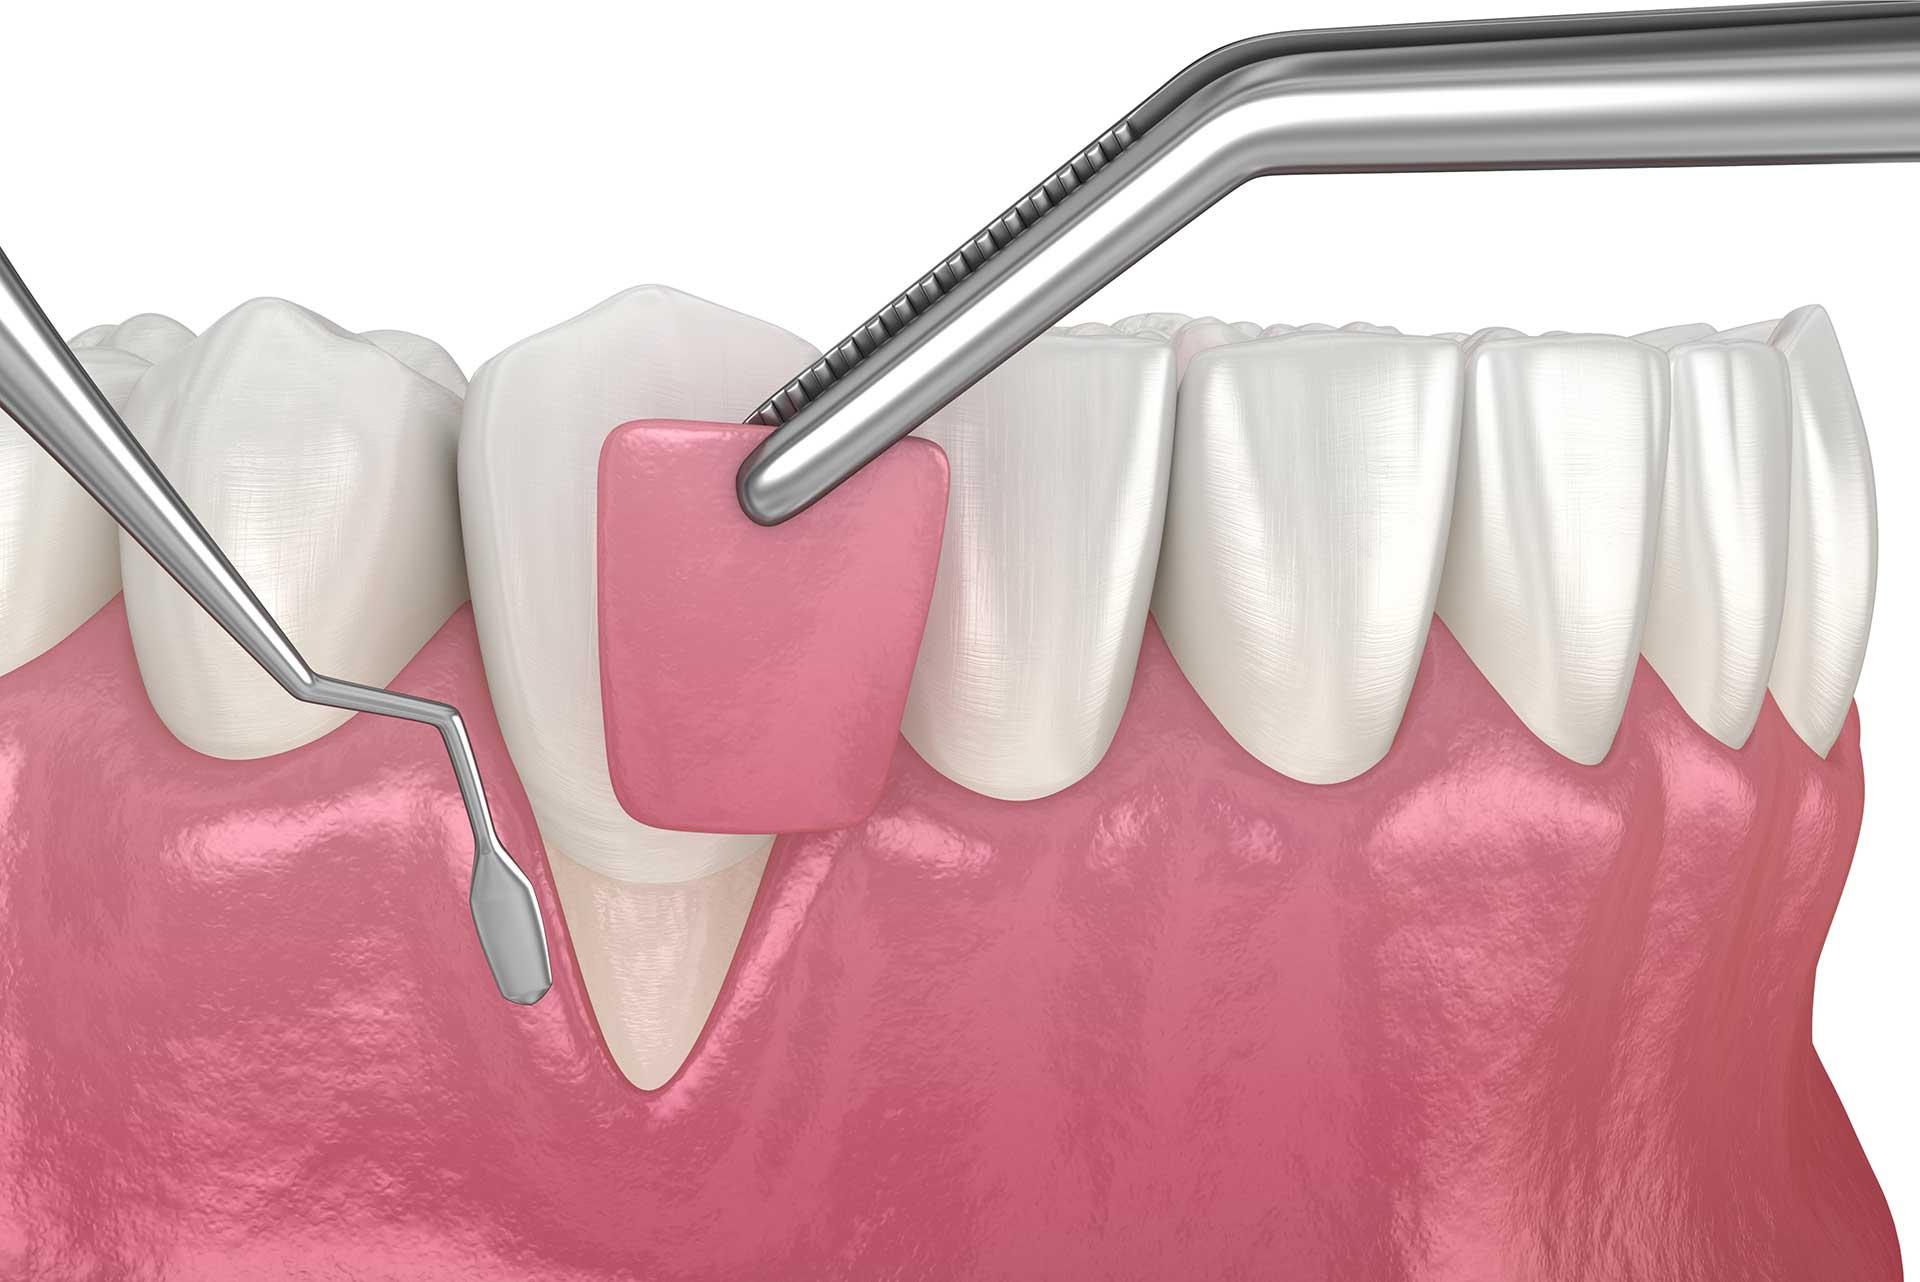 Advanced periodontal disease: gum graft and gum disease surgery